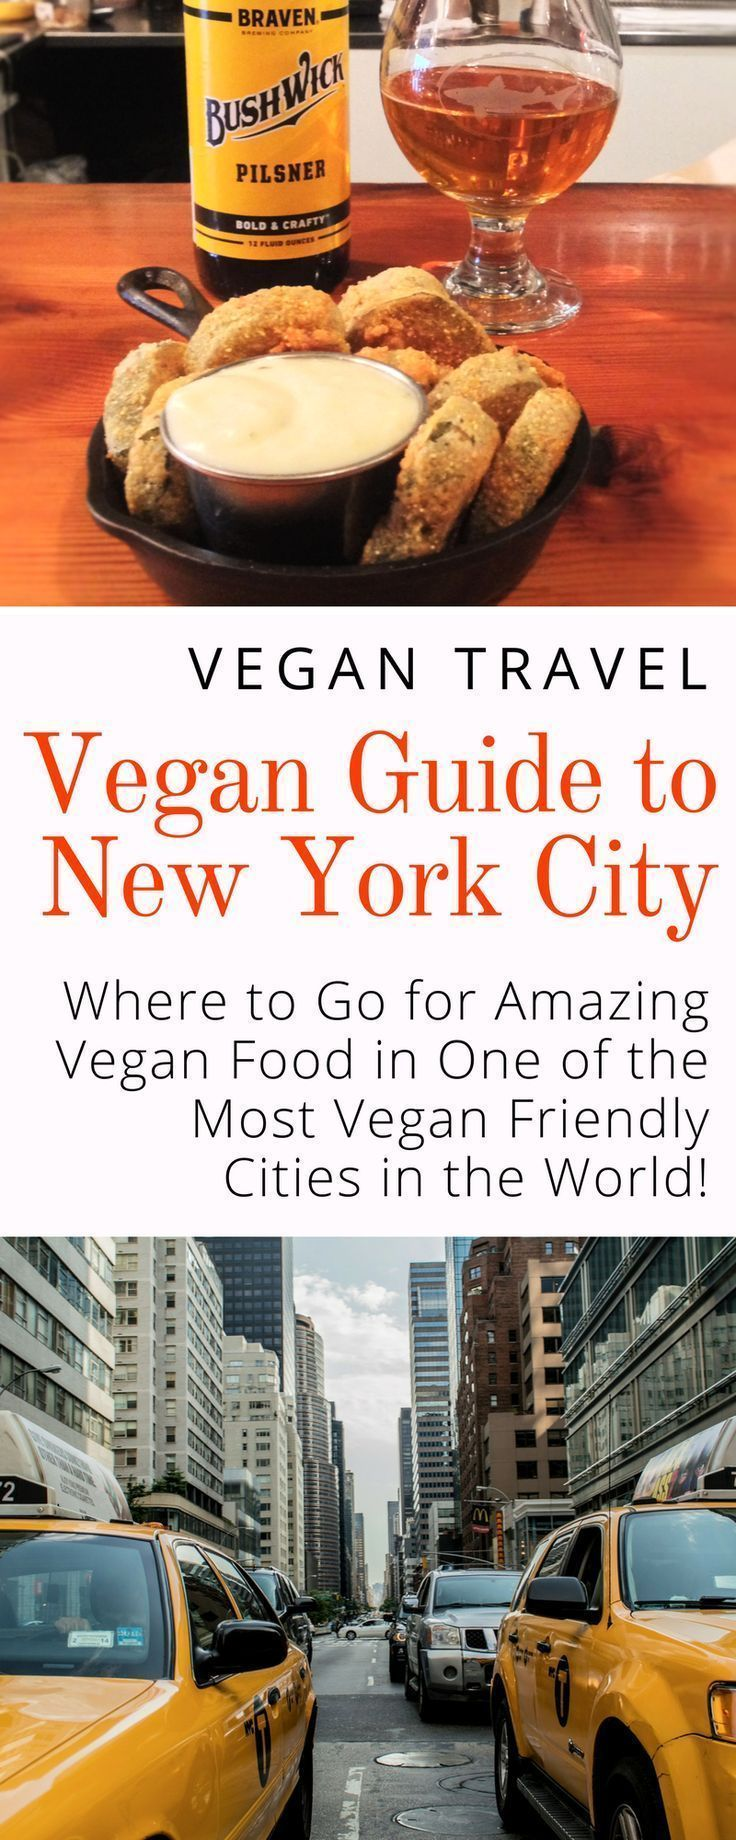 Some Of The Best Vegan Food In New York City Vegan Travel Guide Veggie Visa Vegan Travel Vegan Restaurants Vegan Nyc